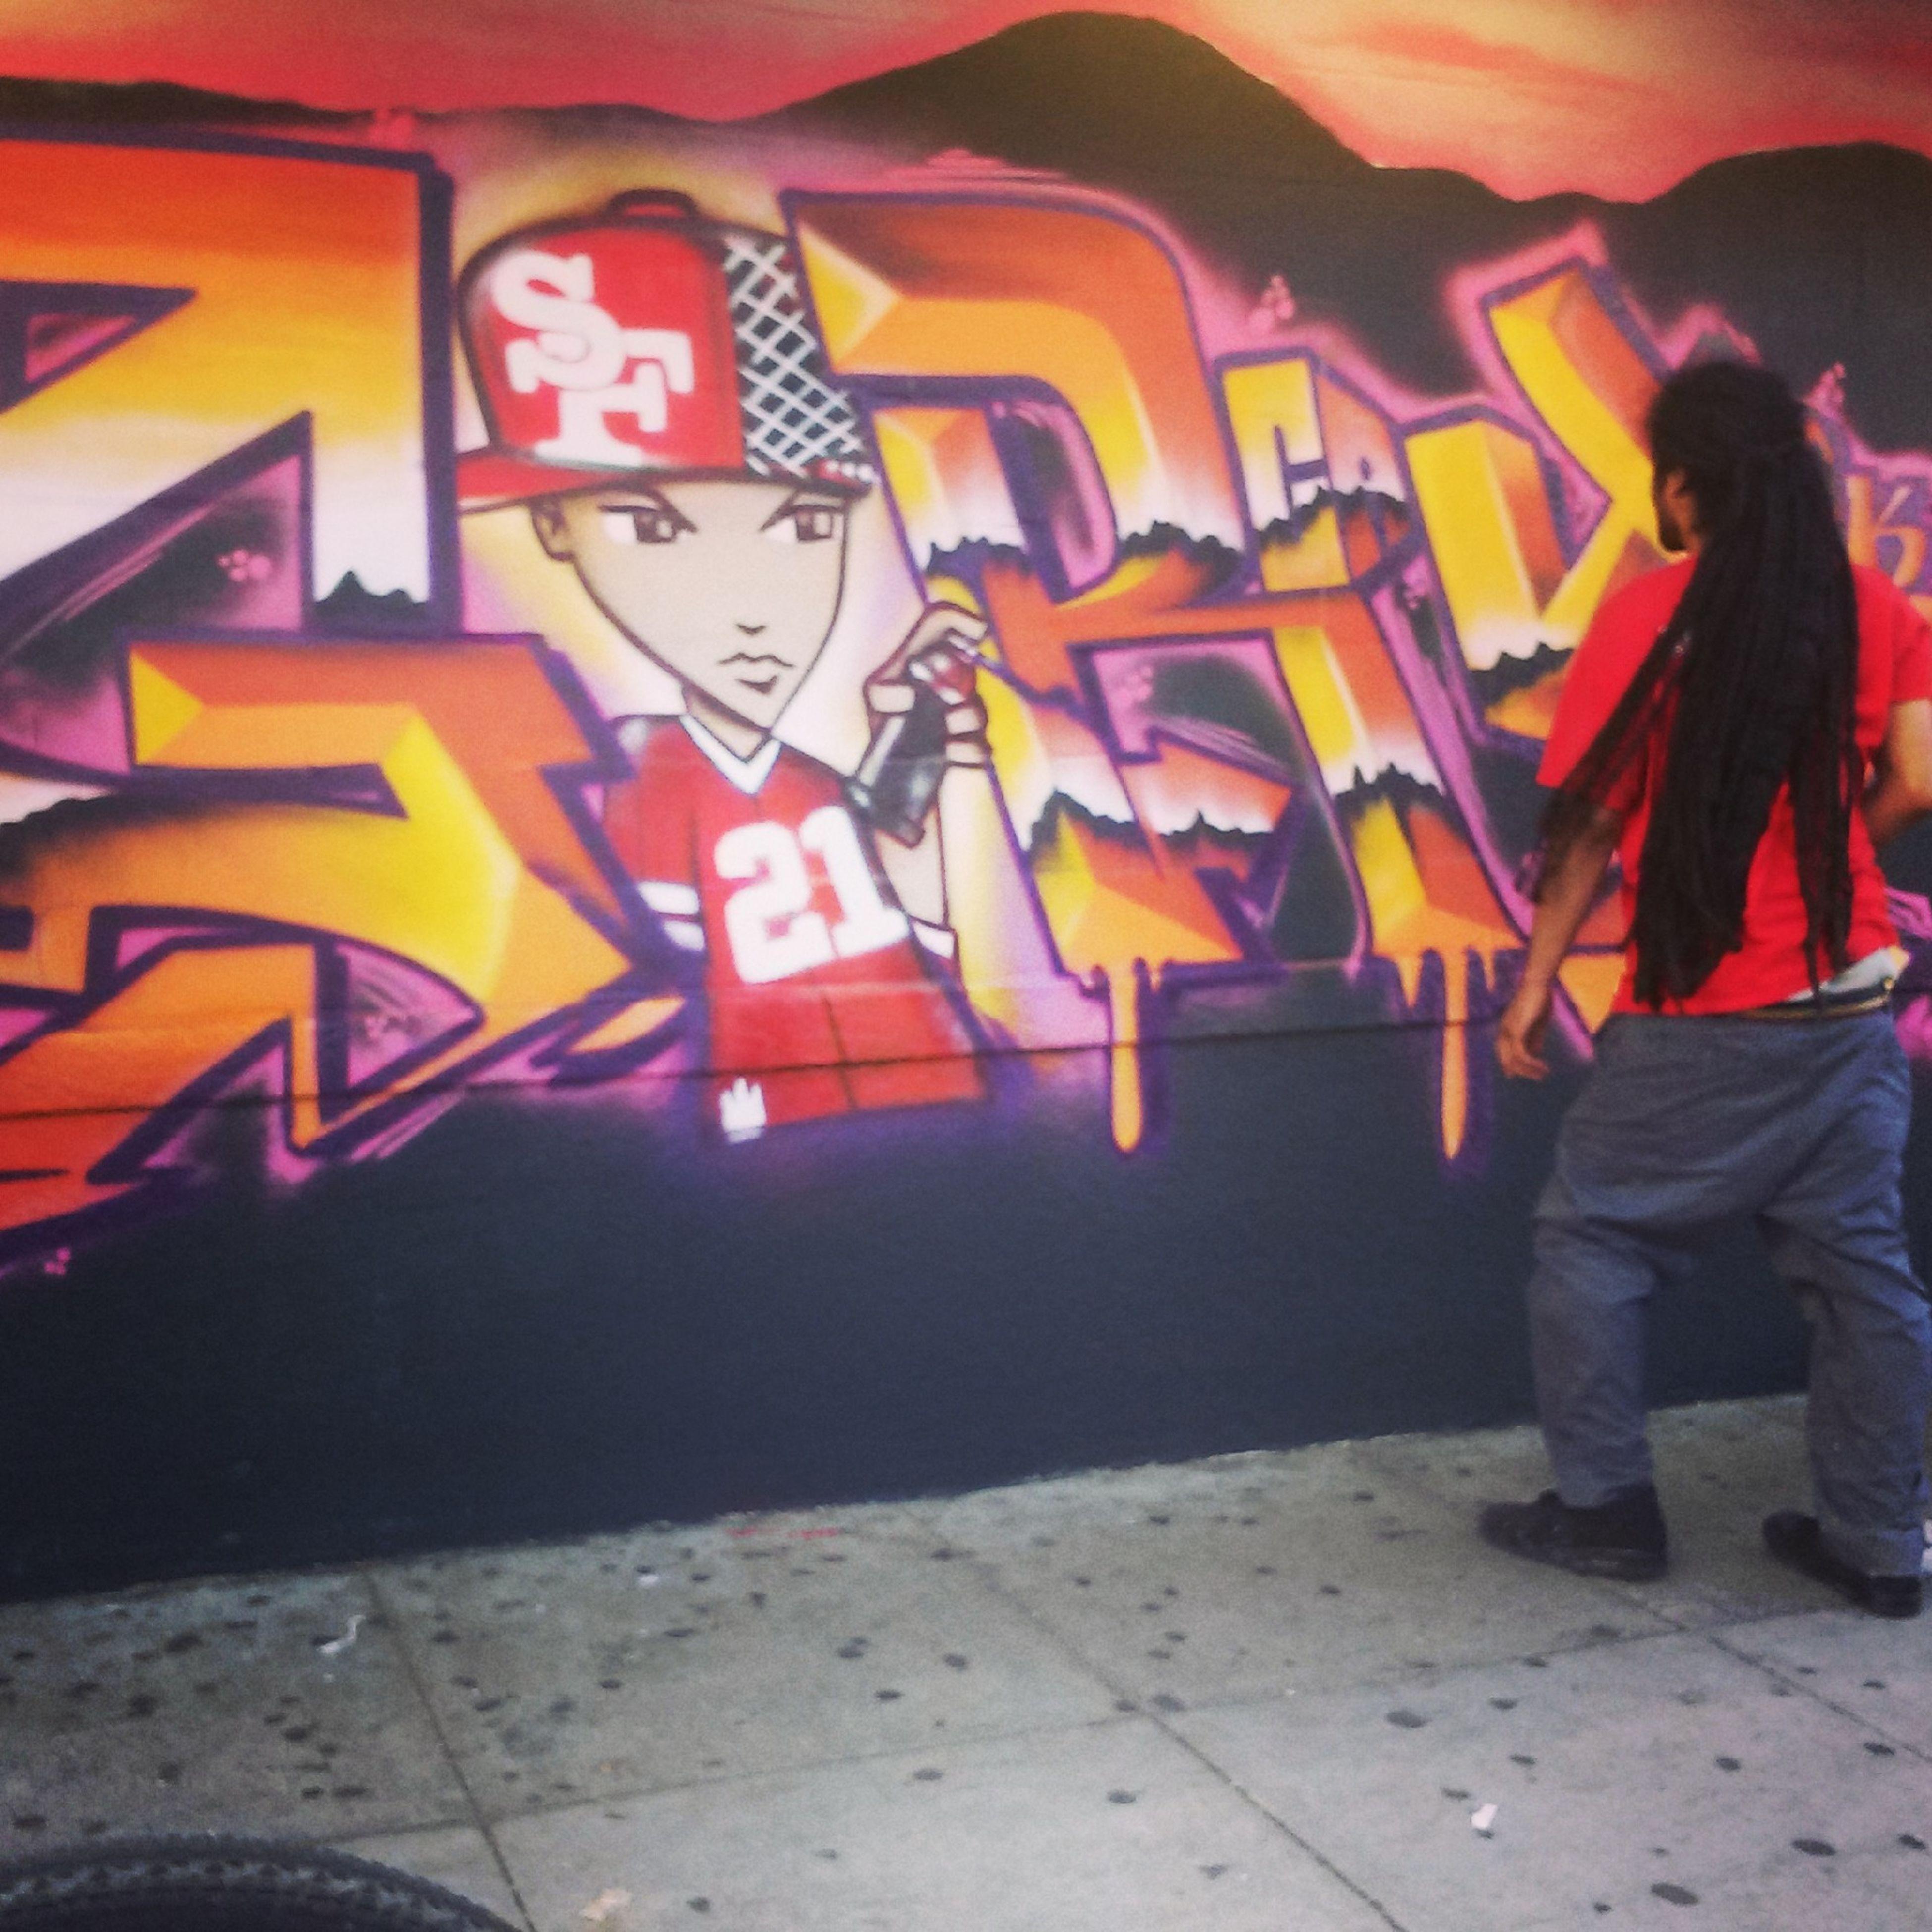 Beautiful Art work done in San Francisco. San Bruno. artist in Action. undone. Taking Photos Enjoying Life